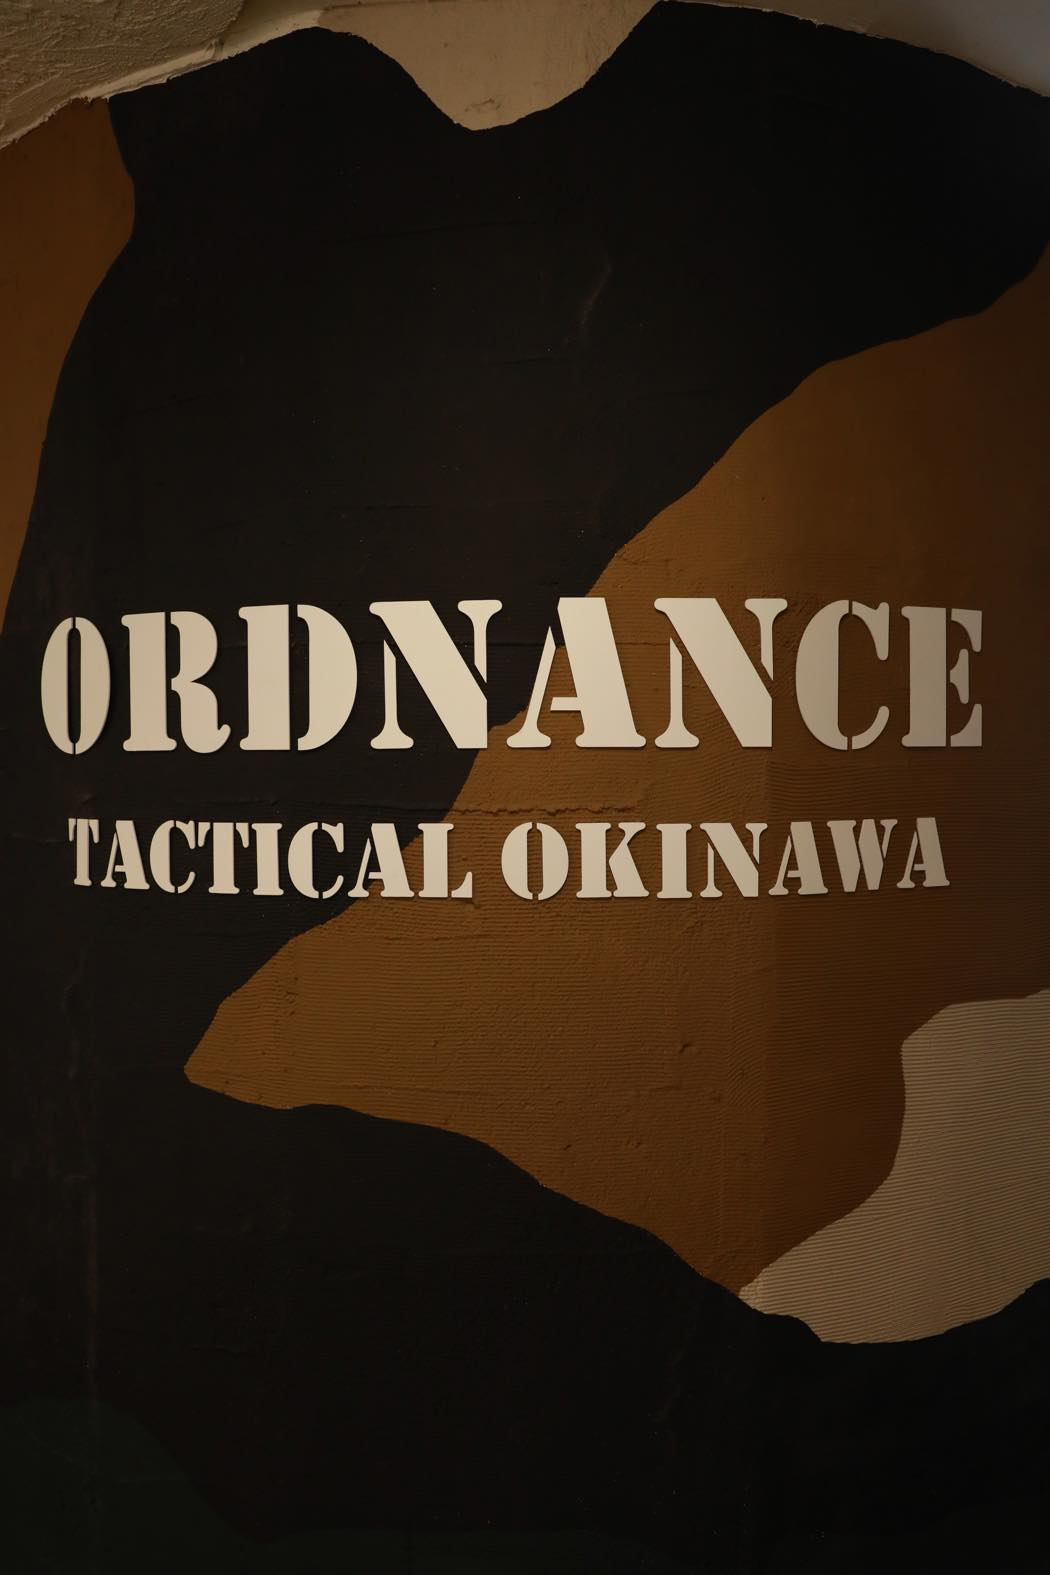 ORDNANCE TACTICAL GEAR CHATAN BRANCH オードナンスタクティカルギア 北谷店